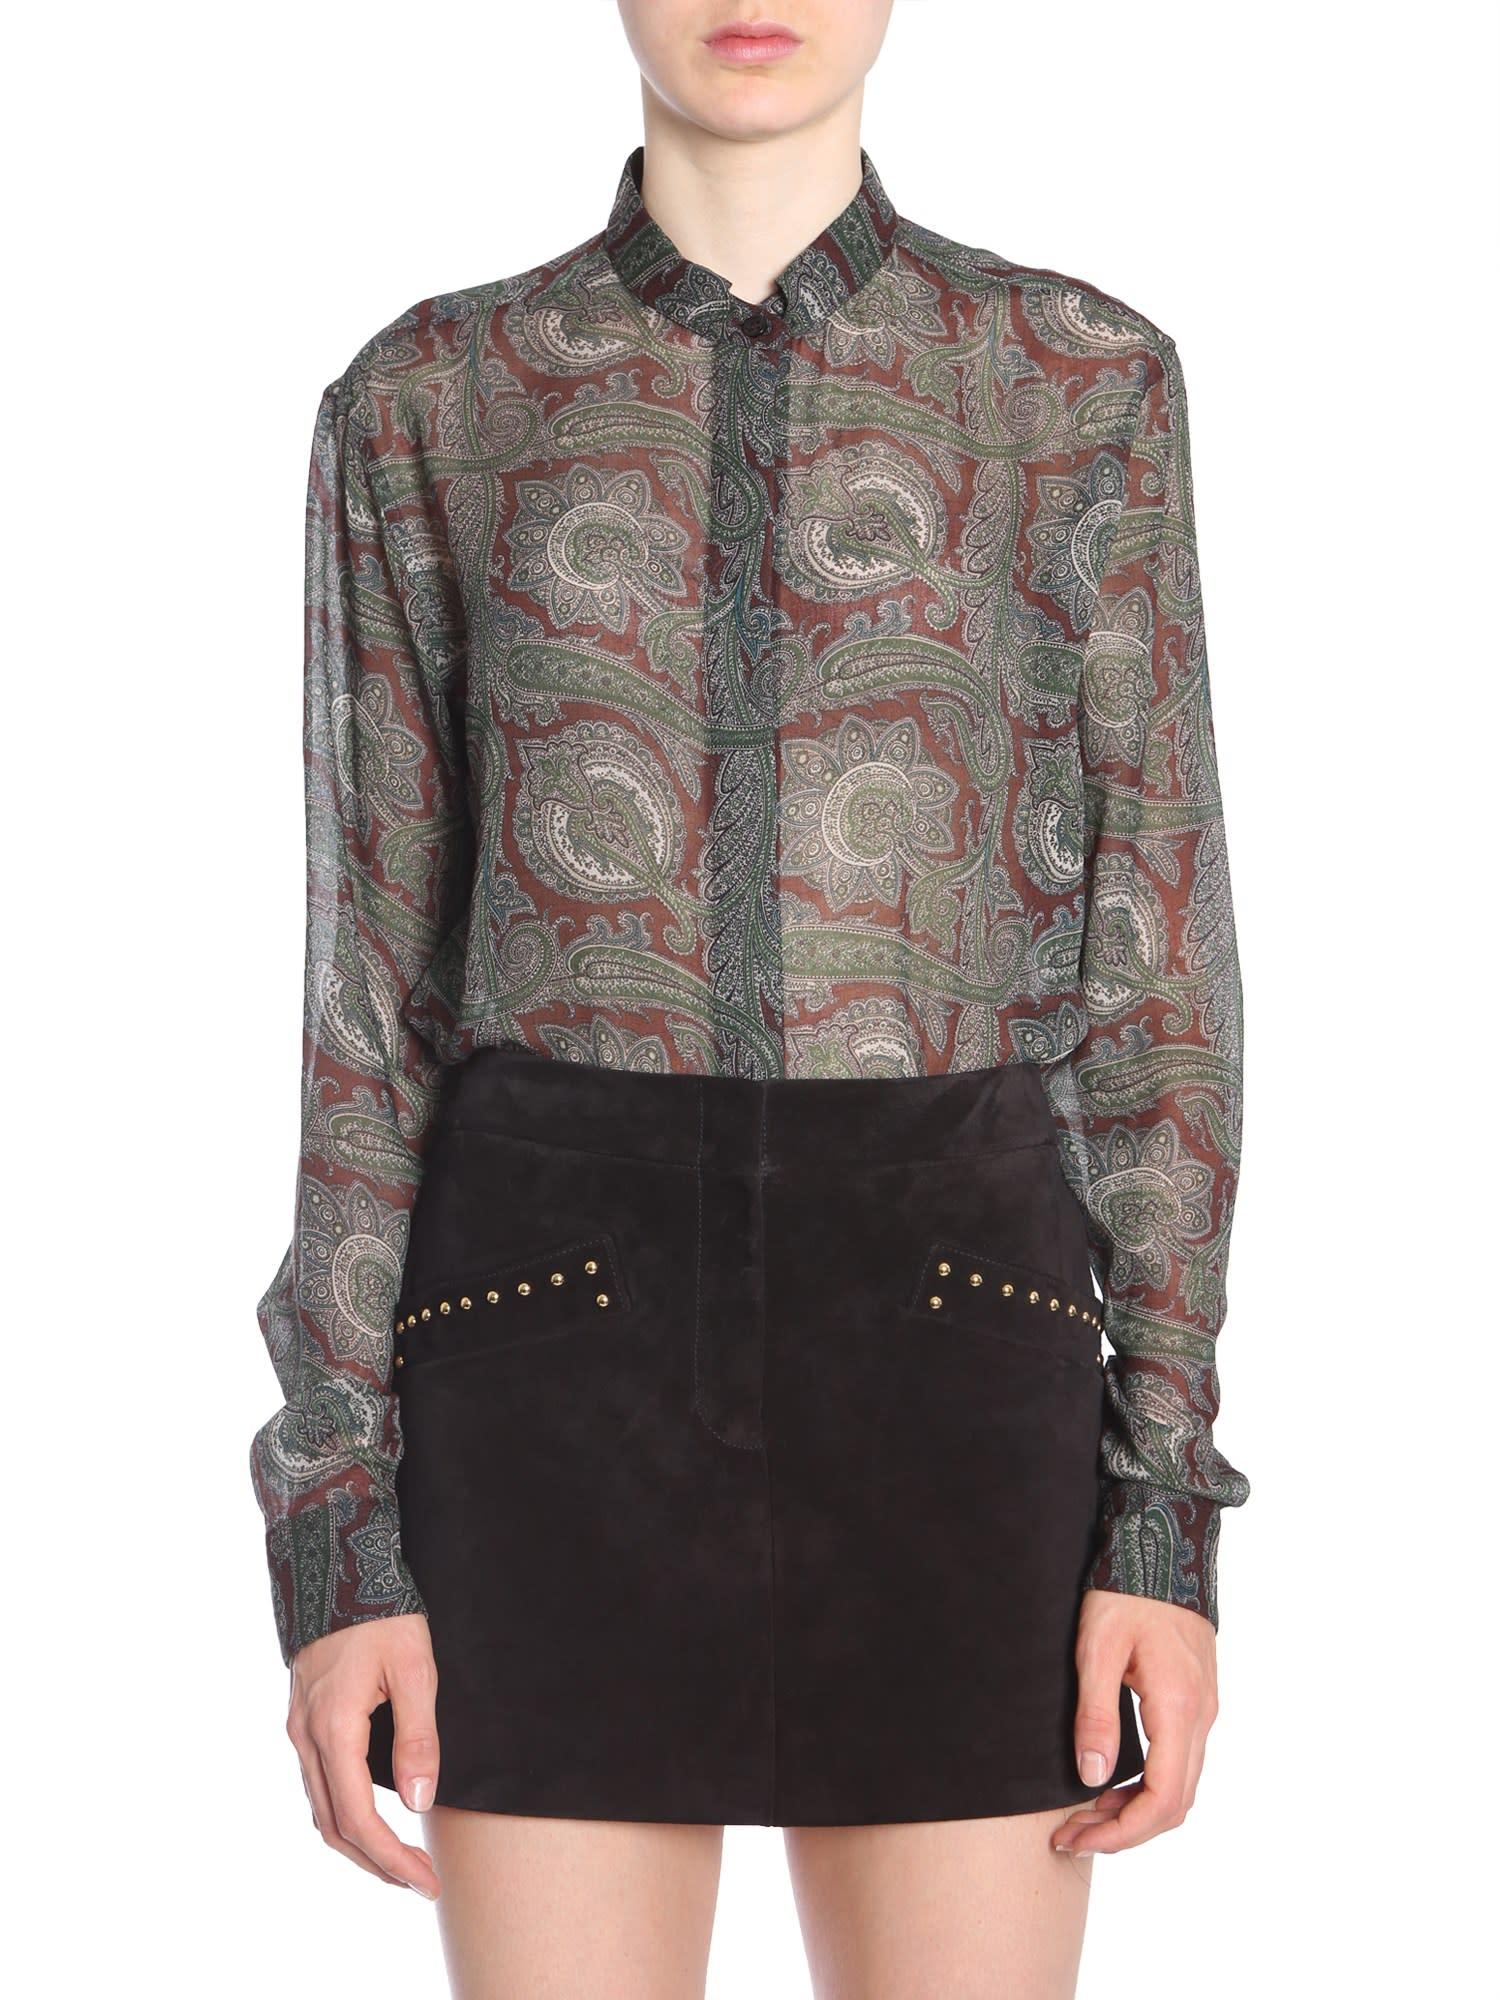 Saint Laurent Band Collar Shirt